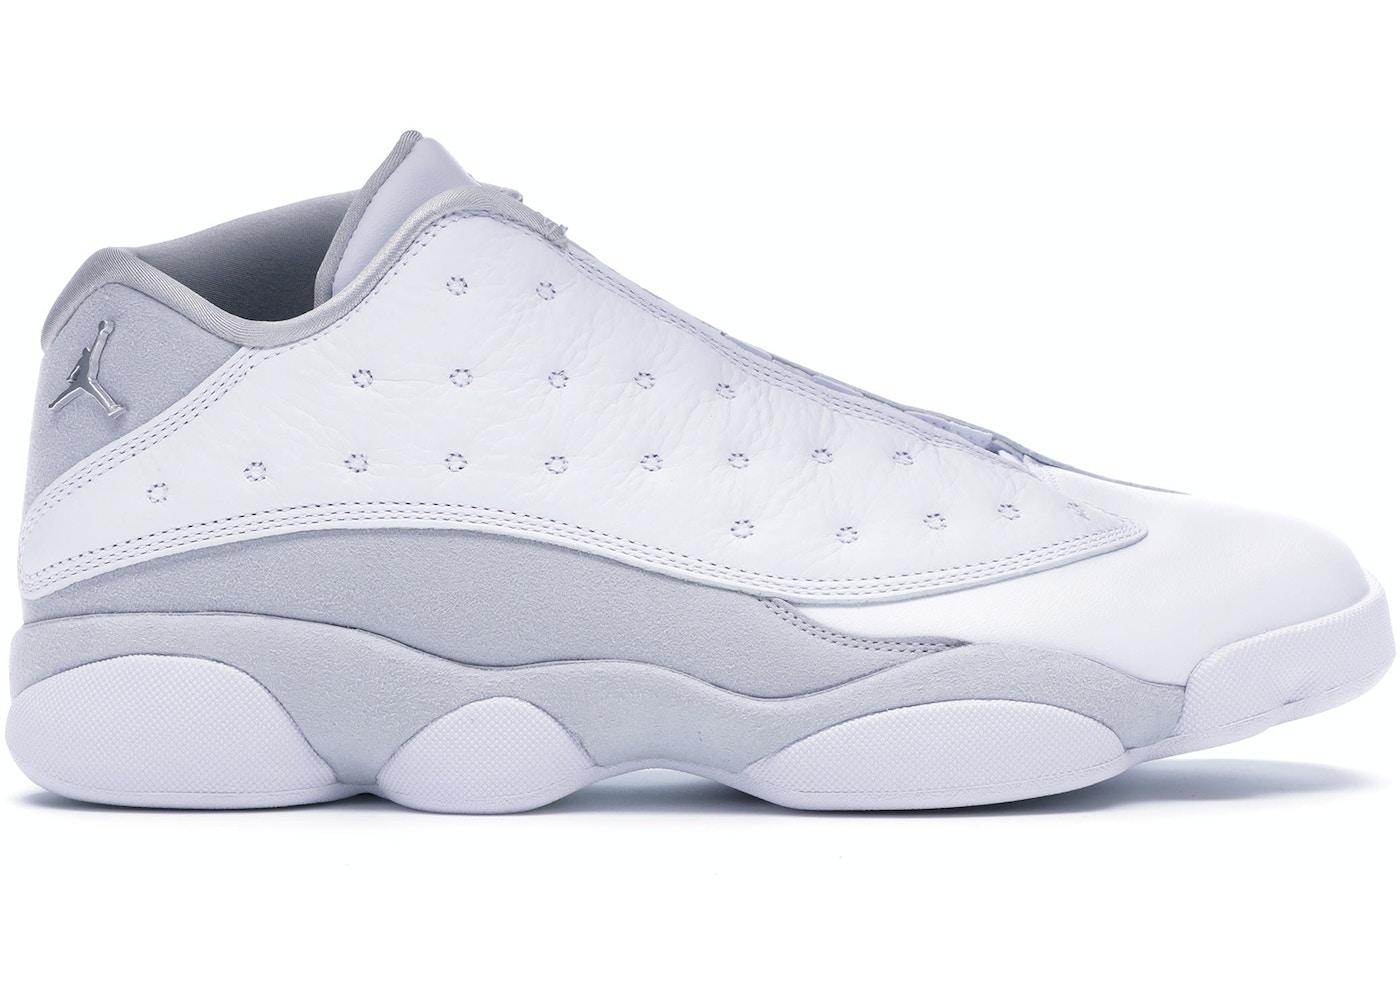 0c2381ca876c89 Air Jordan 13 Size 16 Shoes - Release Date